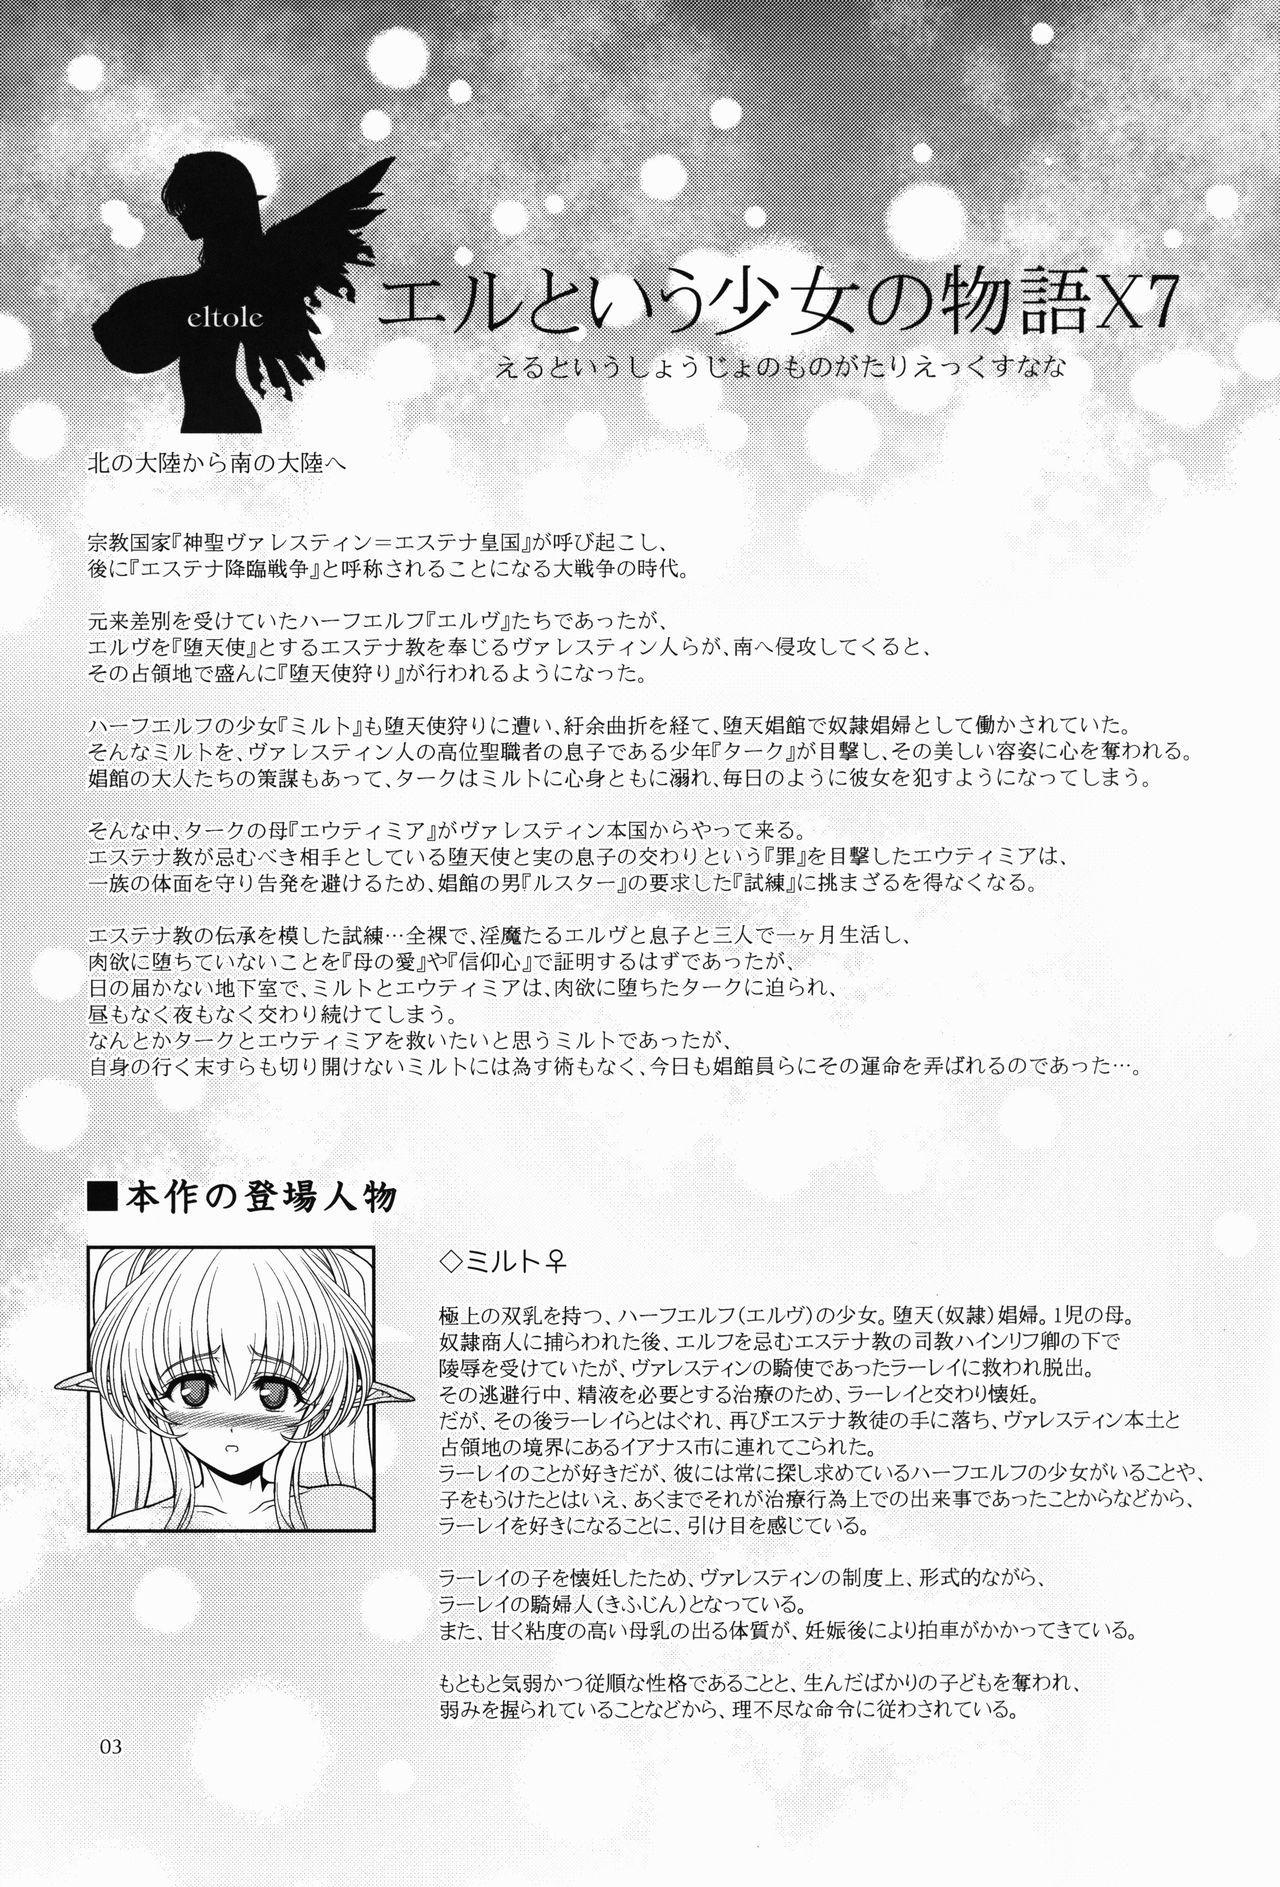 El toiu Shoujo no Monogatari X7 2